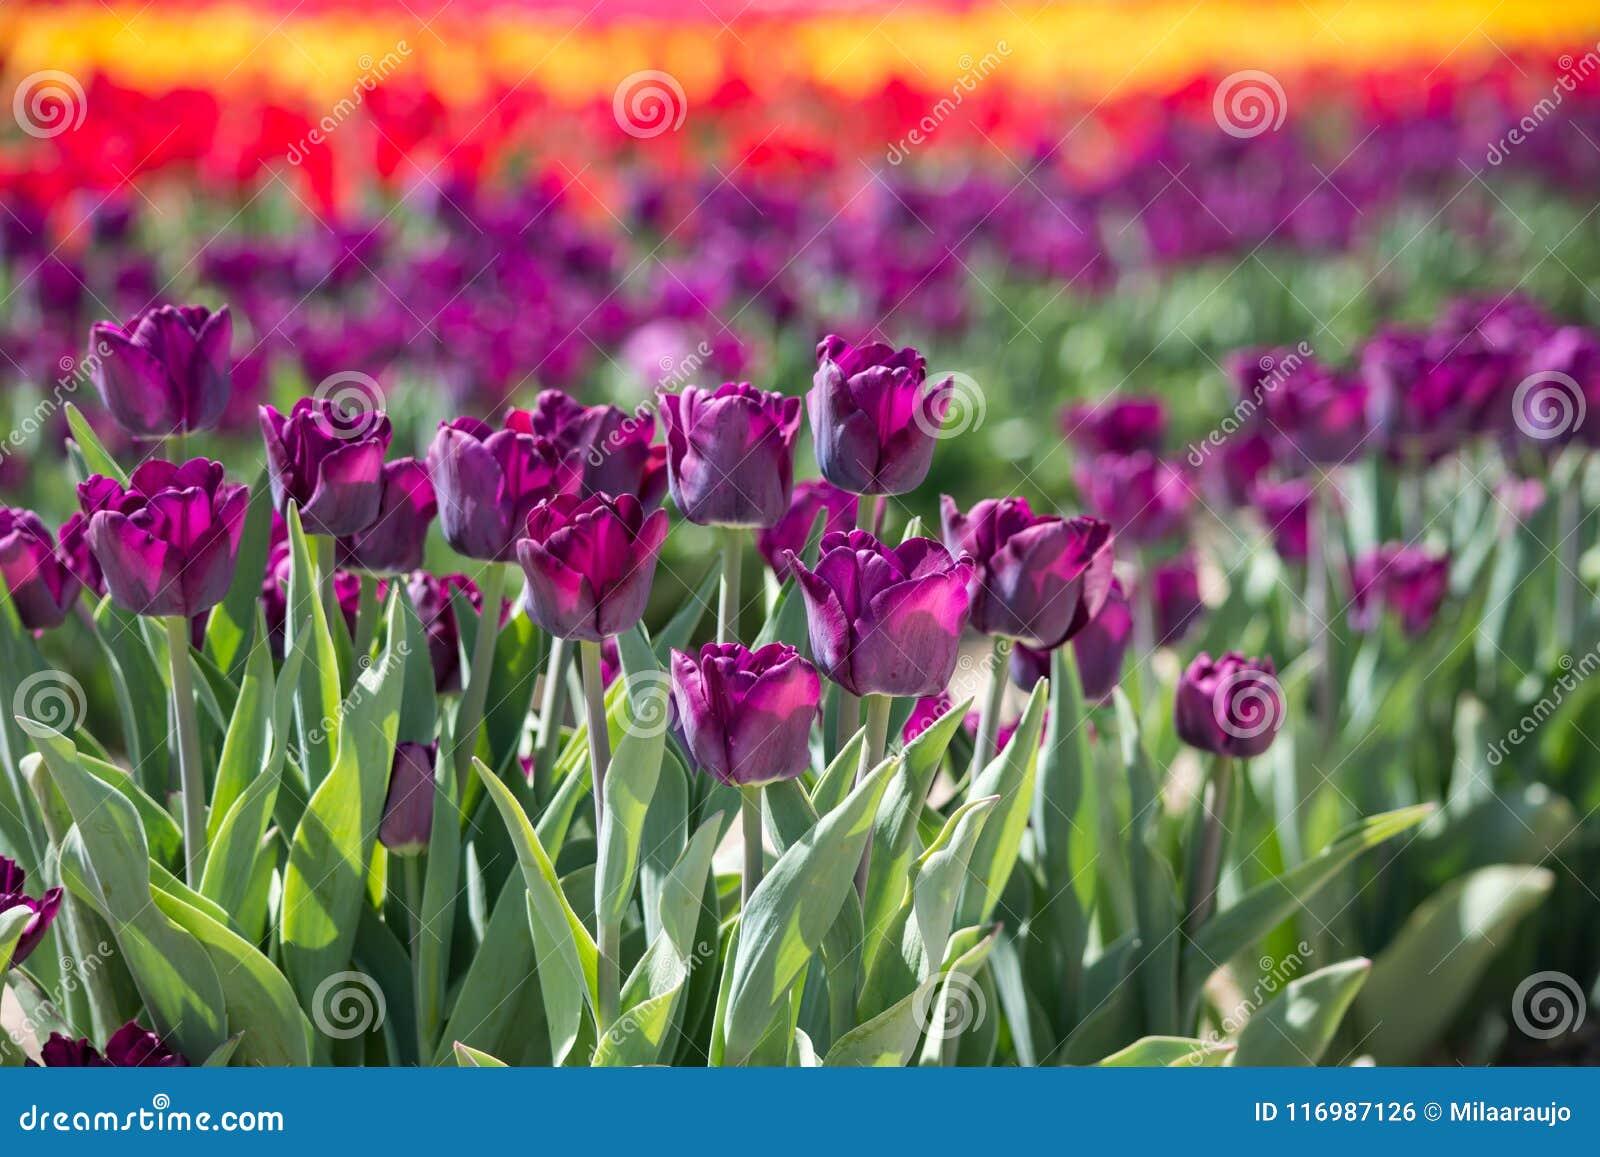 Beautiful field of tulips stock photo image of flowers 116987126 download beautiful field of tulips stock photo image of flowers 116987126 izmirmasajfo